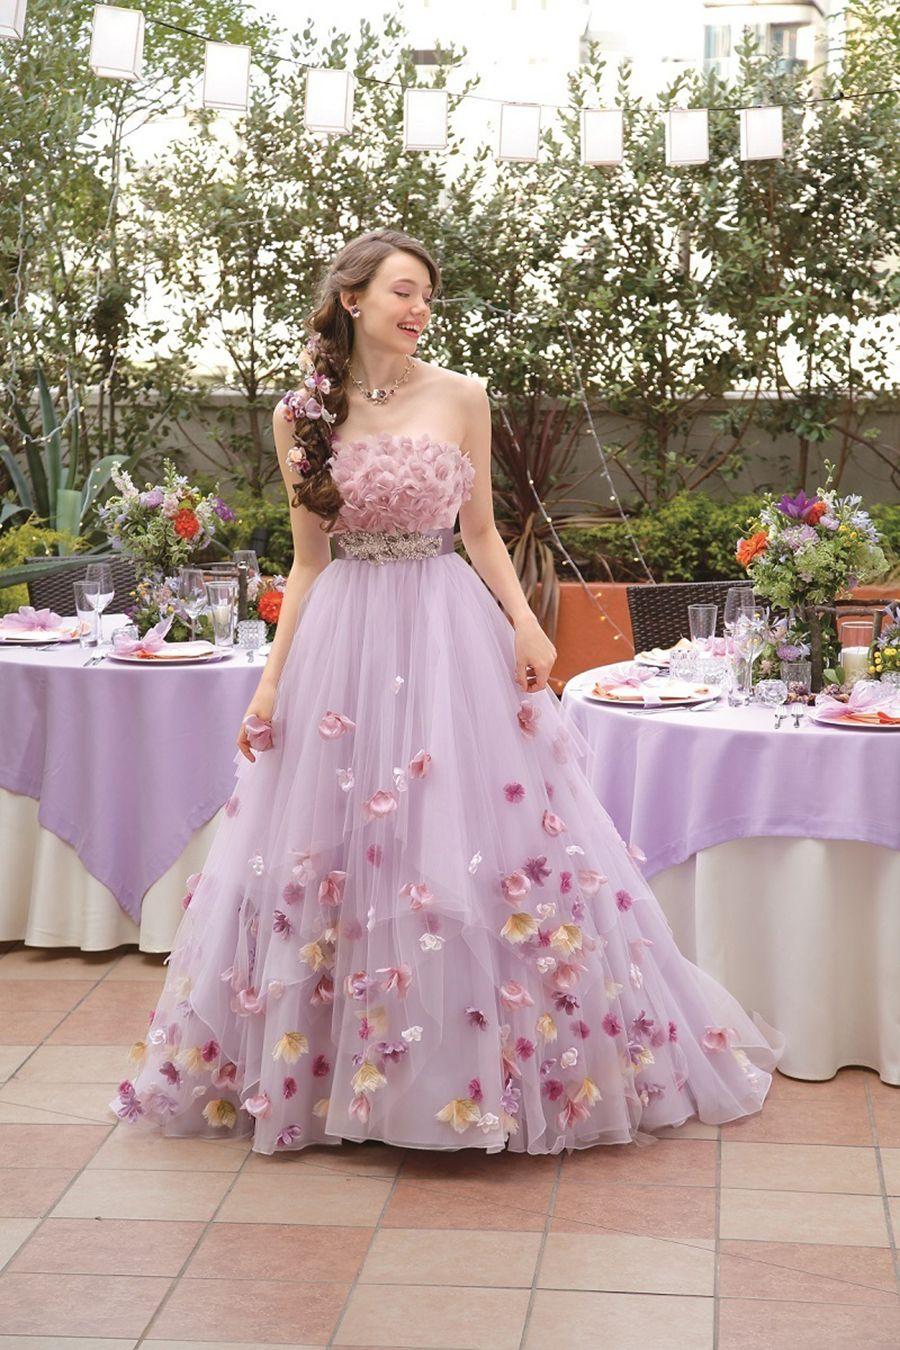 14 Disney Princess Wedding Dresses That Will Make Your